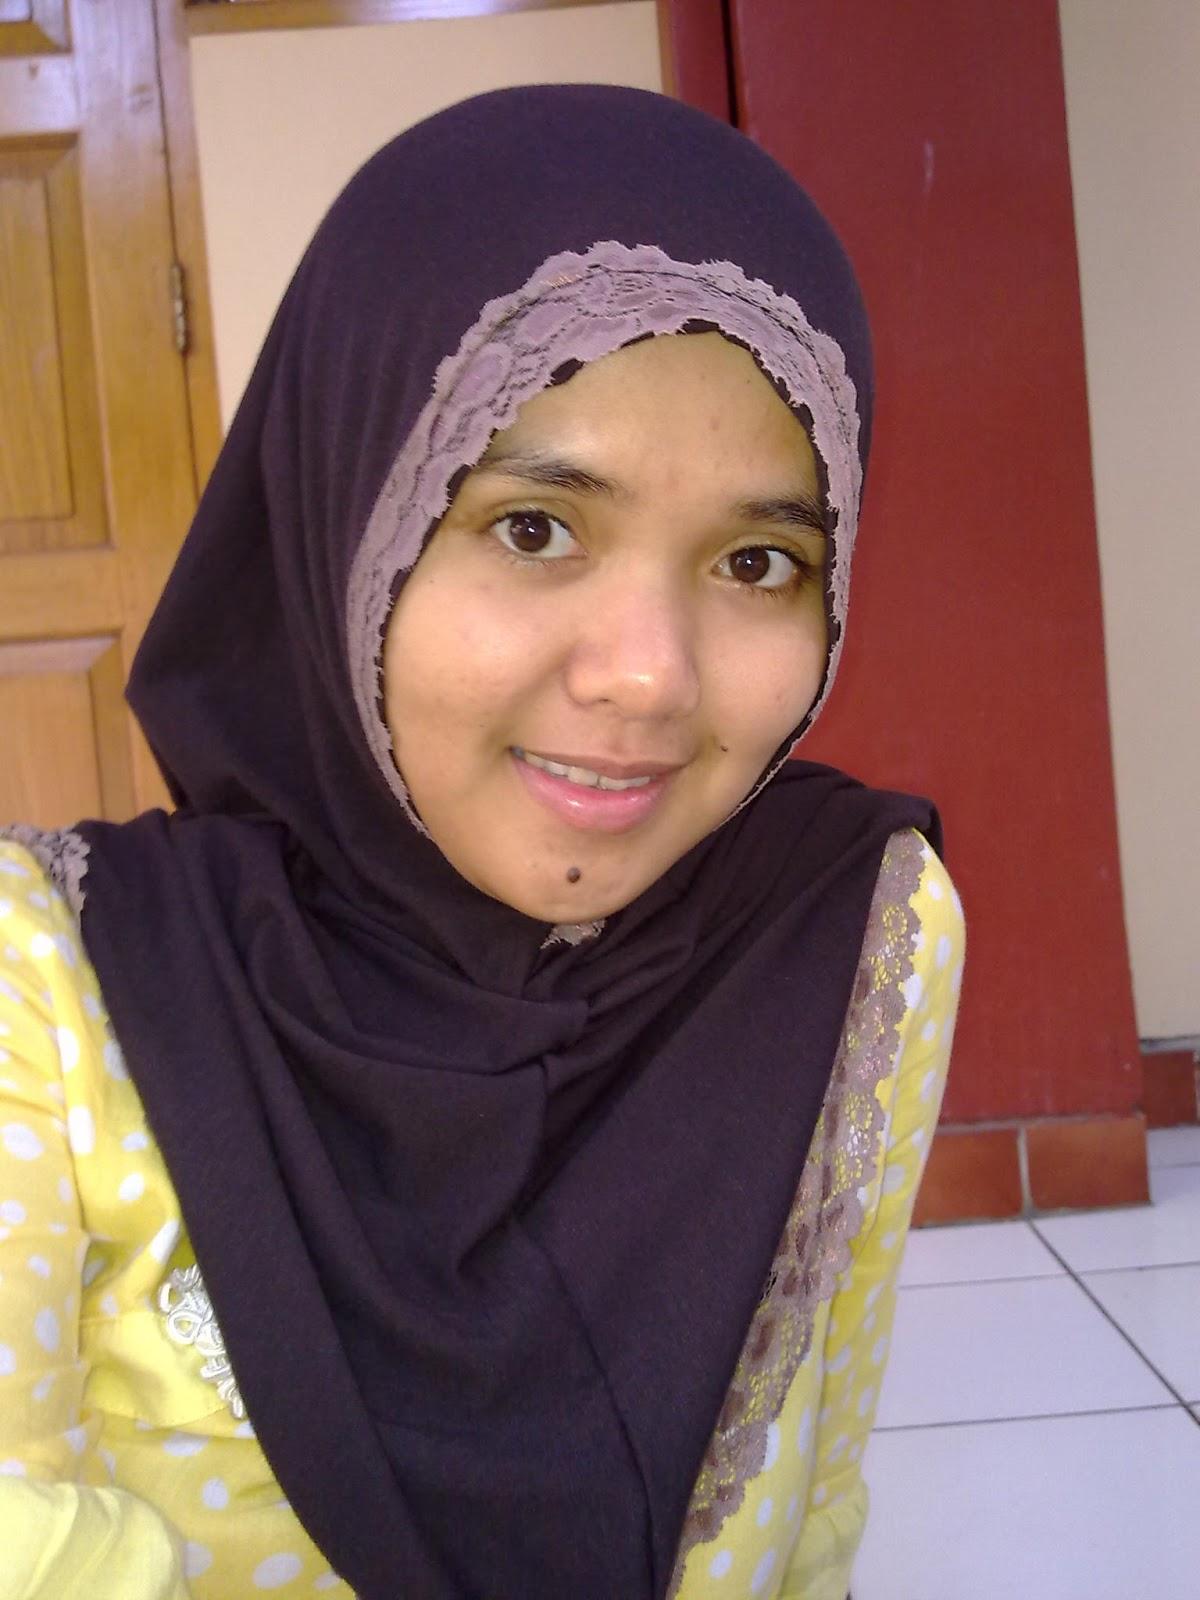 Jilbab Nyepong World News Cewek Bispak Jilbab Umbar Buah